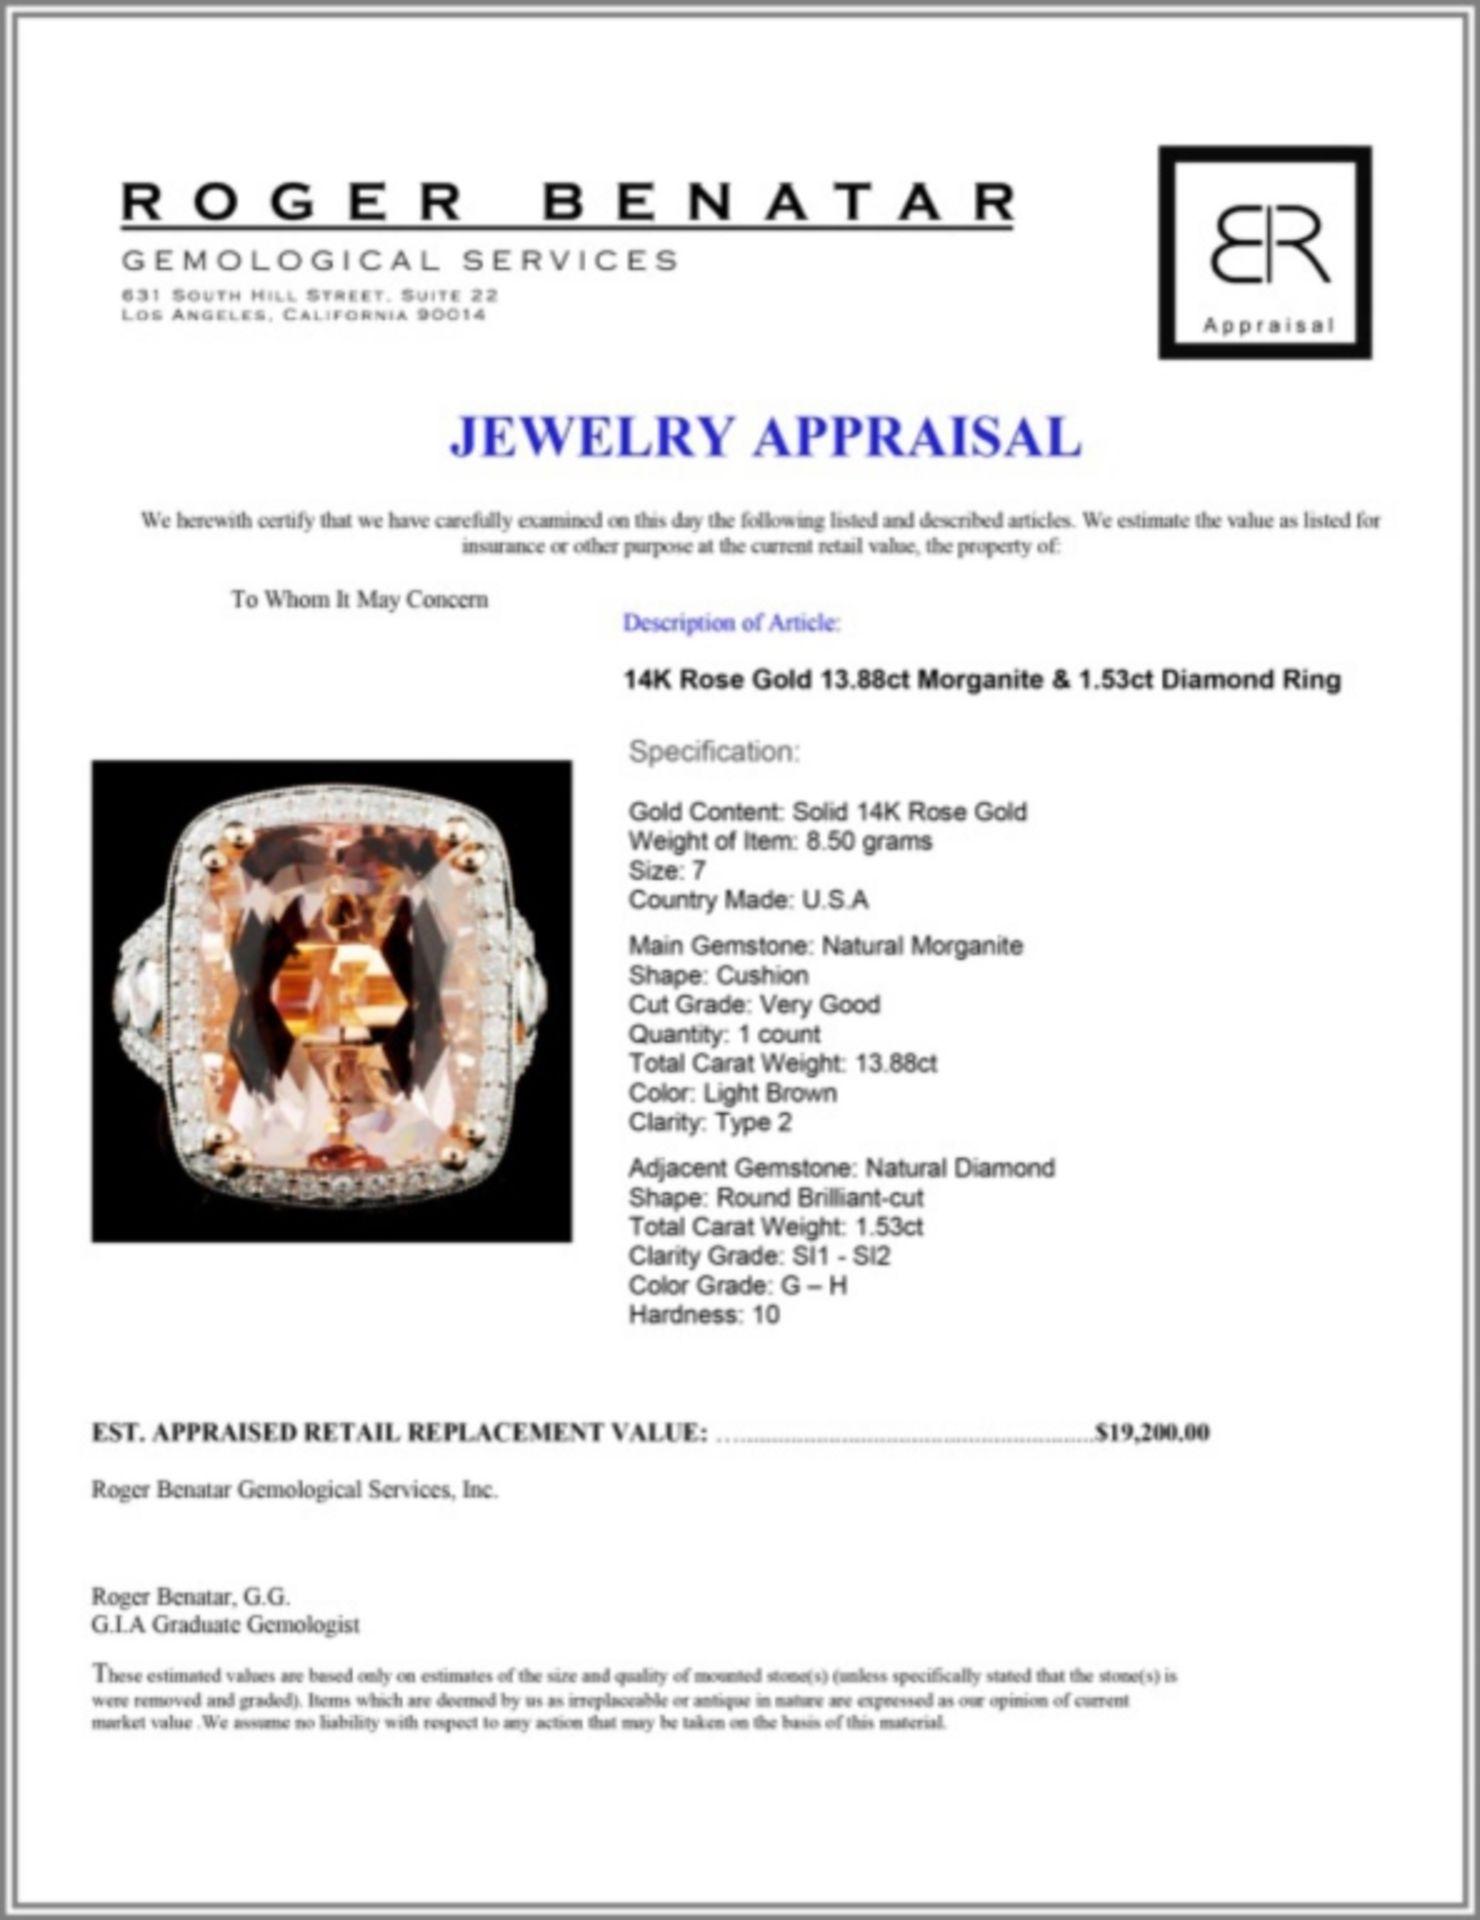 14K Rose Gold 13.88ct Morganite & 1.53ct Diamond R - Image 4 of 4